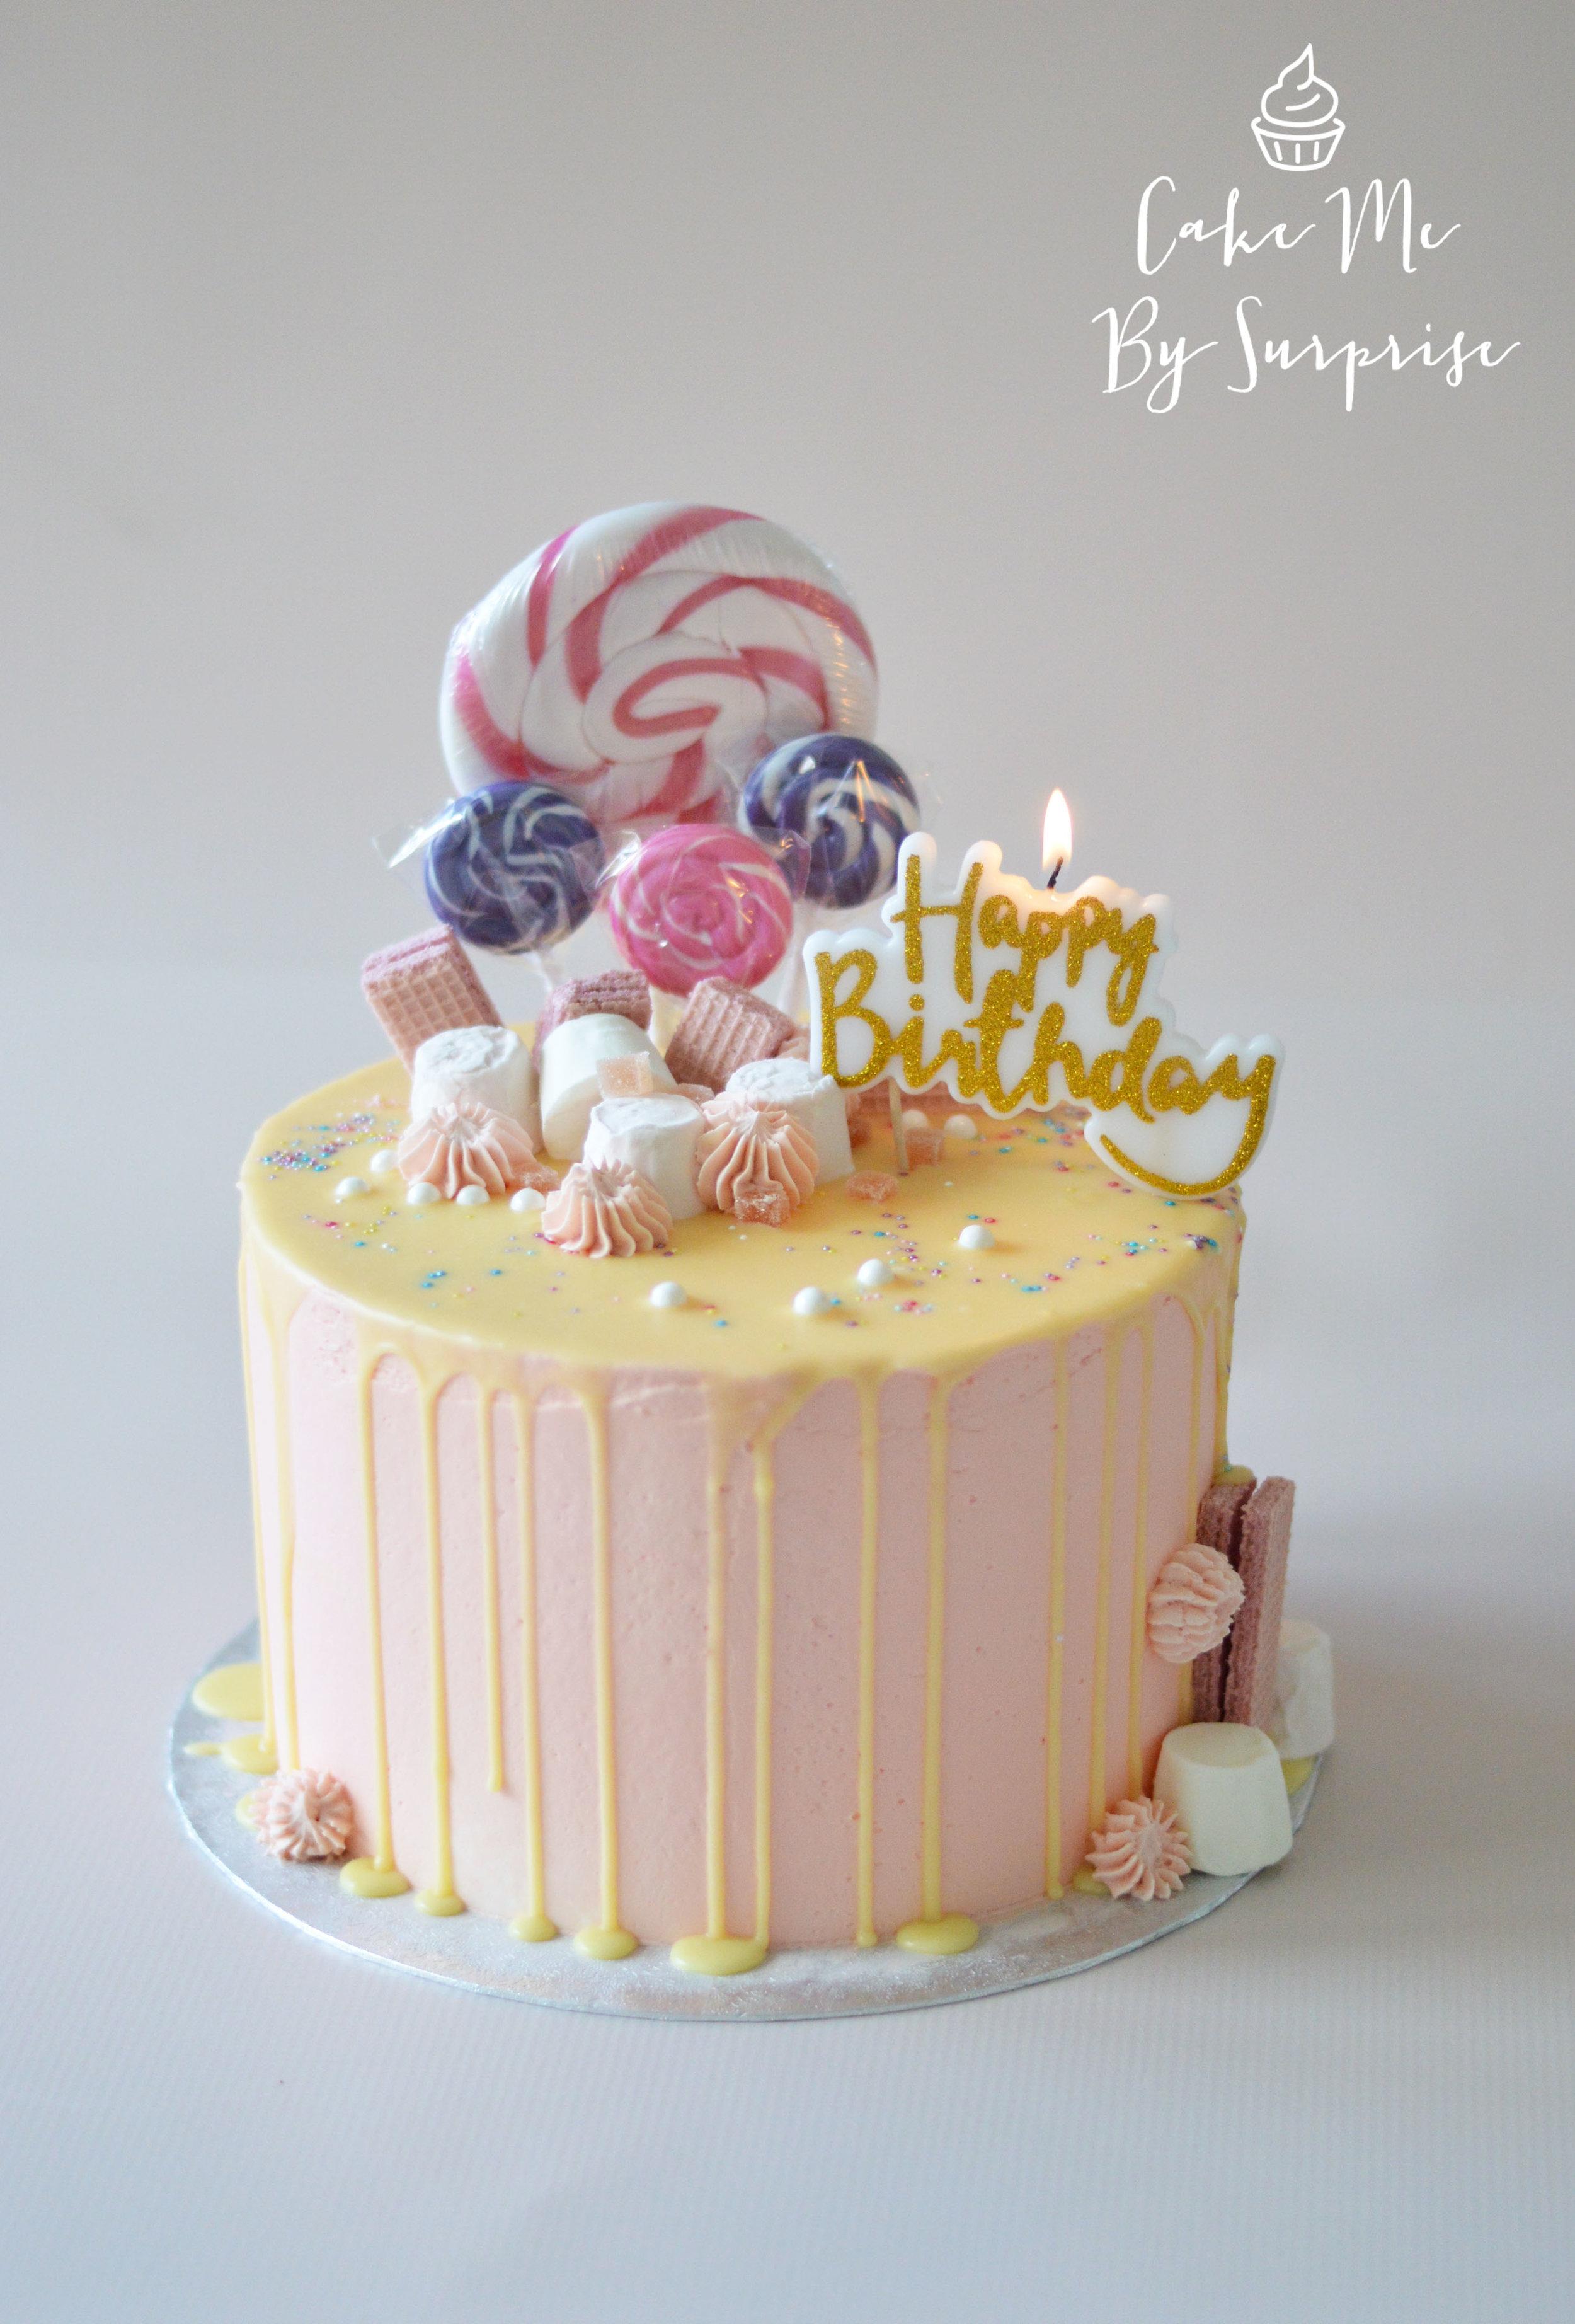 Terrific Sweet Shop Birthday Cake Cake Me By Surprise Birthday Cards Printable Trancafe Filternl